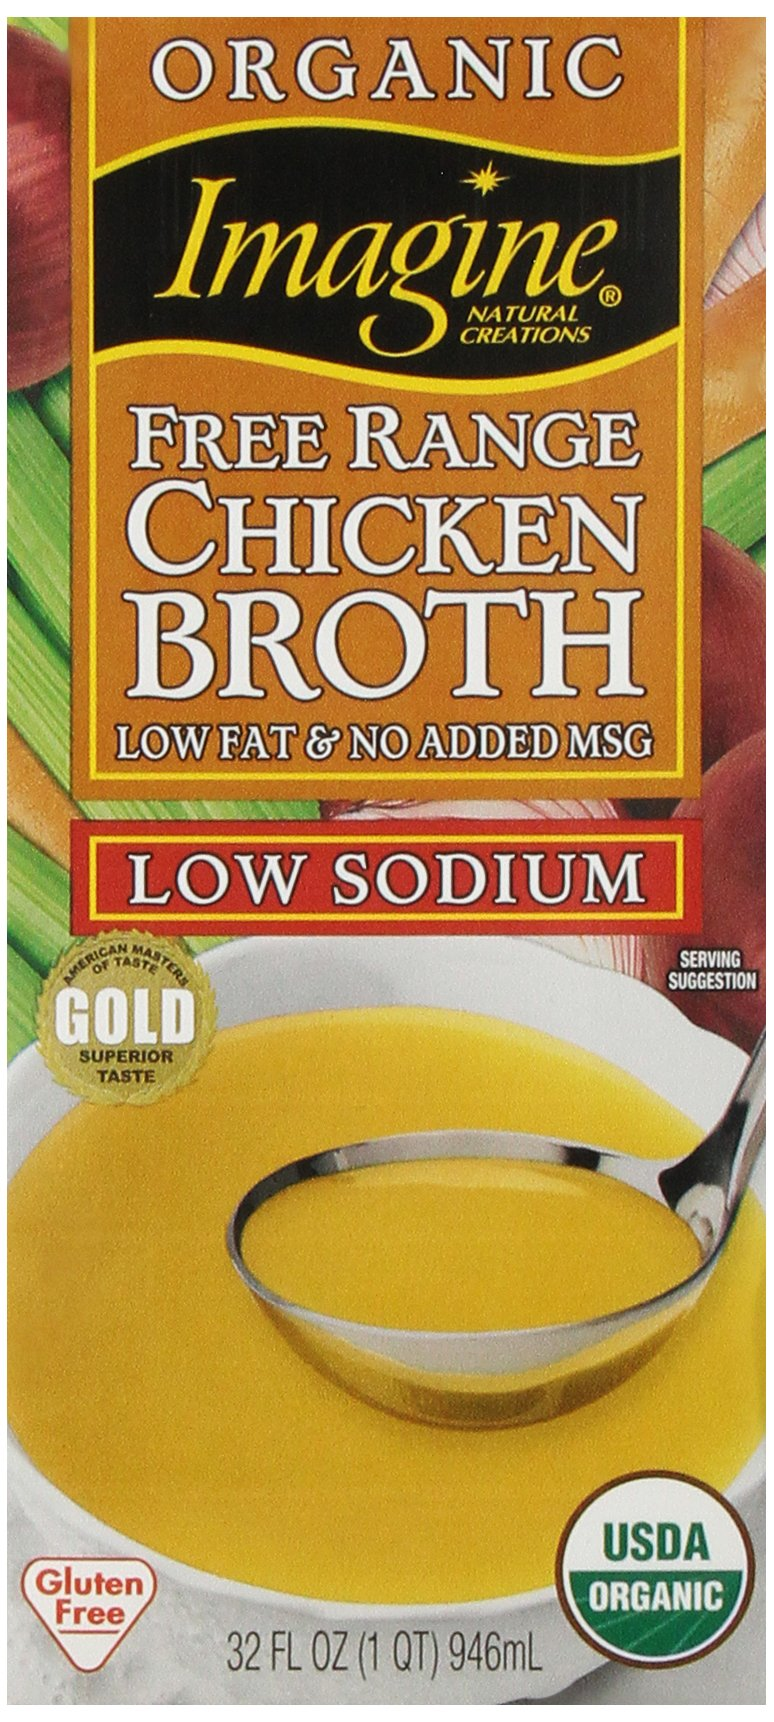 Imagine Free Range Chicken Broth, Organic, Low Sodium, 32 oz by Imagine Foods